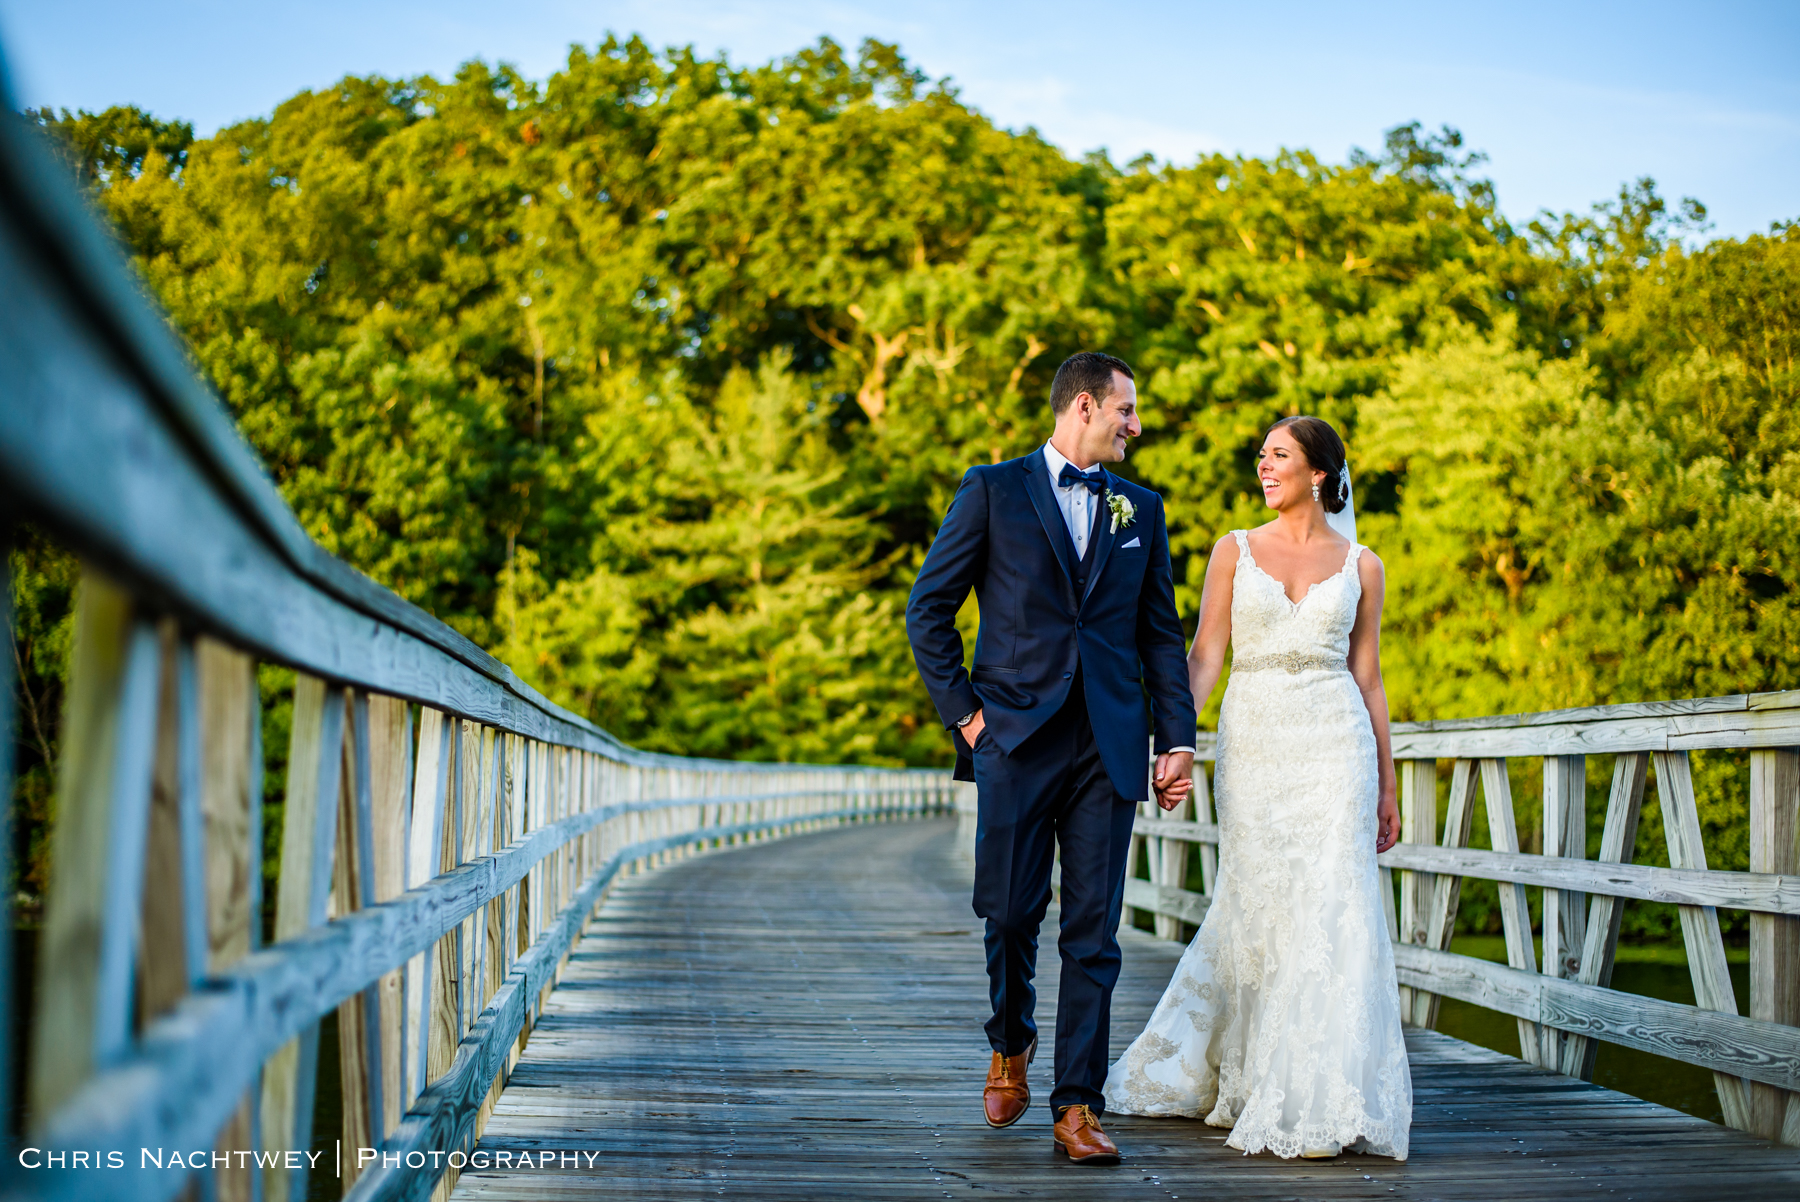 wedding-lake-of-isles-photos-chris-nachtwey-photography-2019-41.jpg